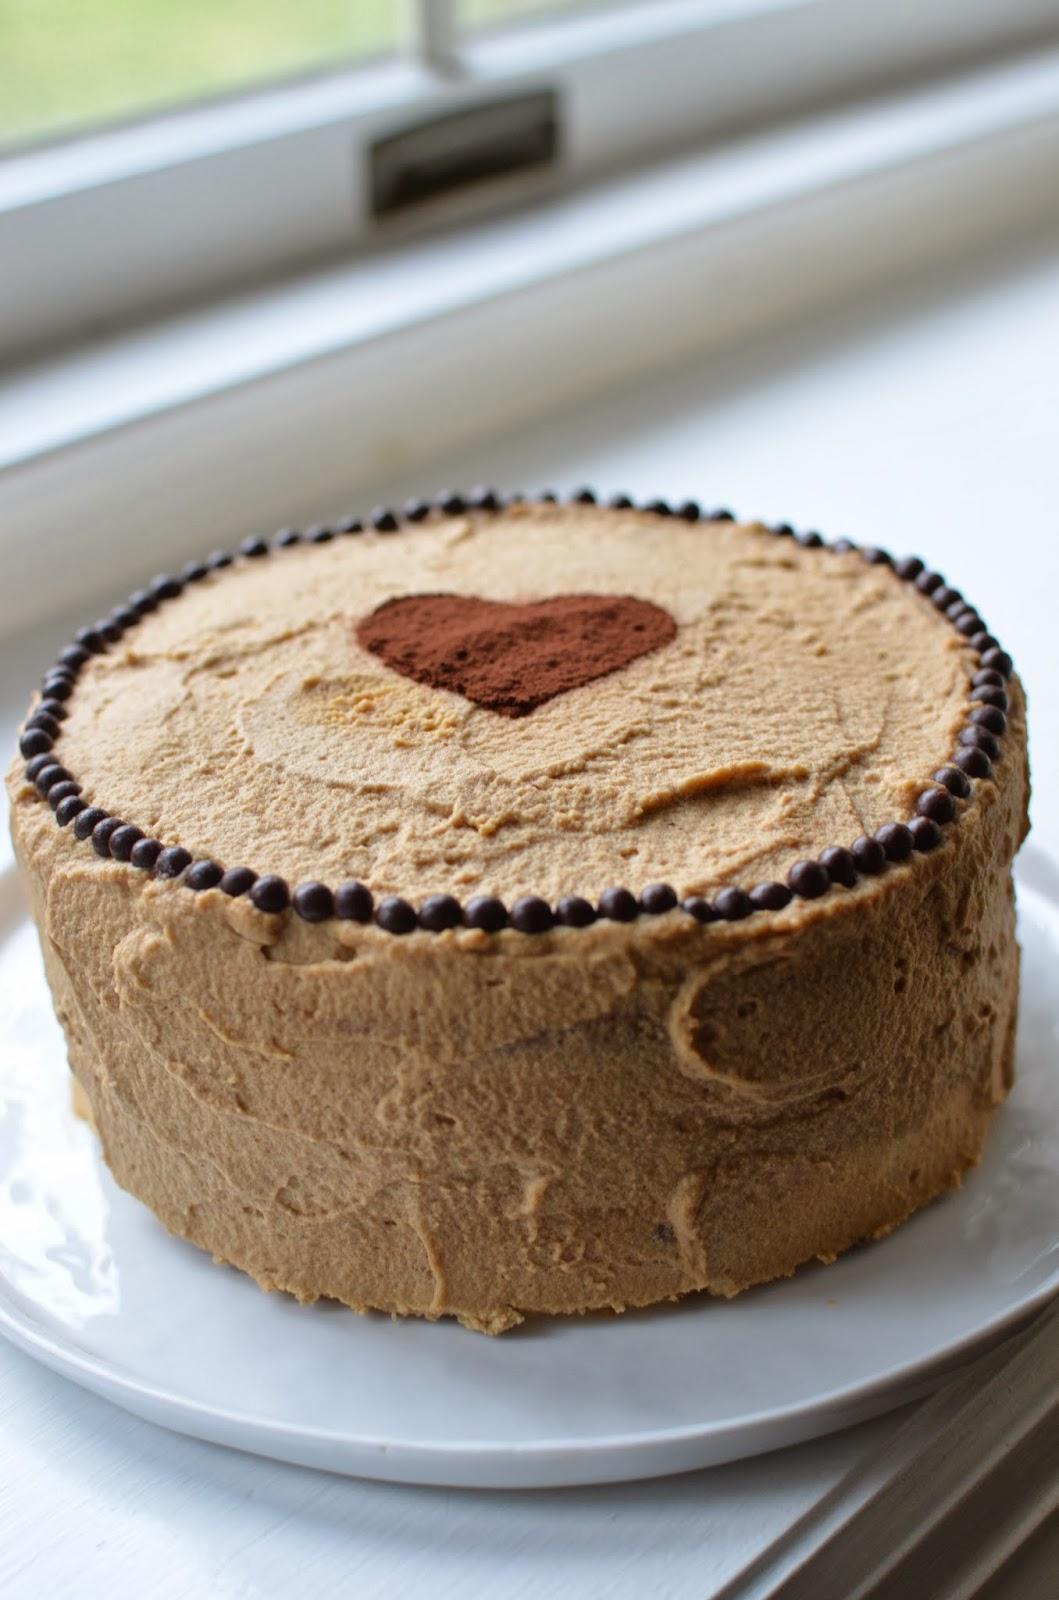 Tiramisu cake for a very special birthday